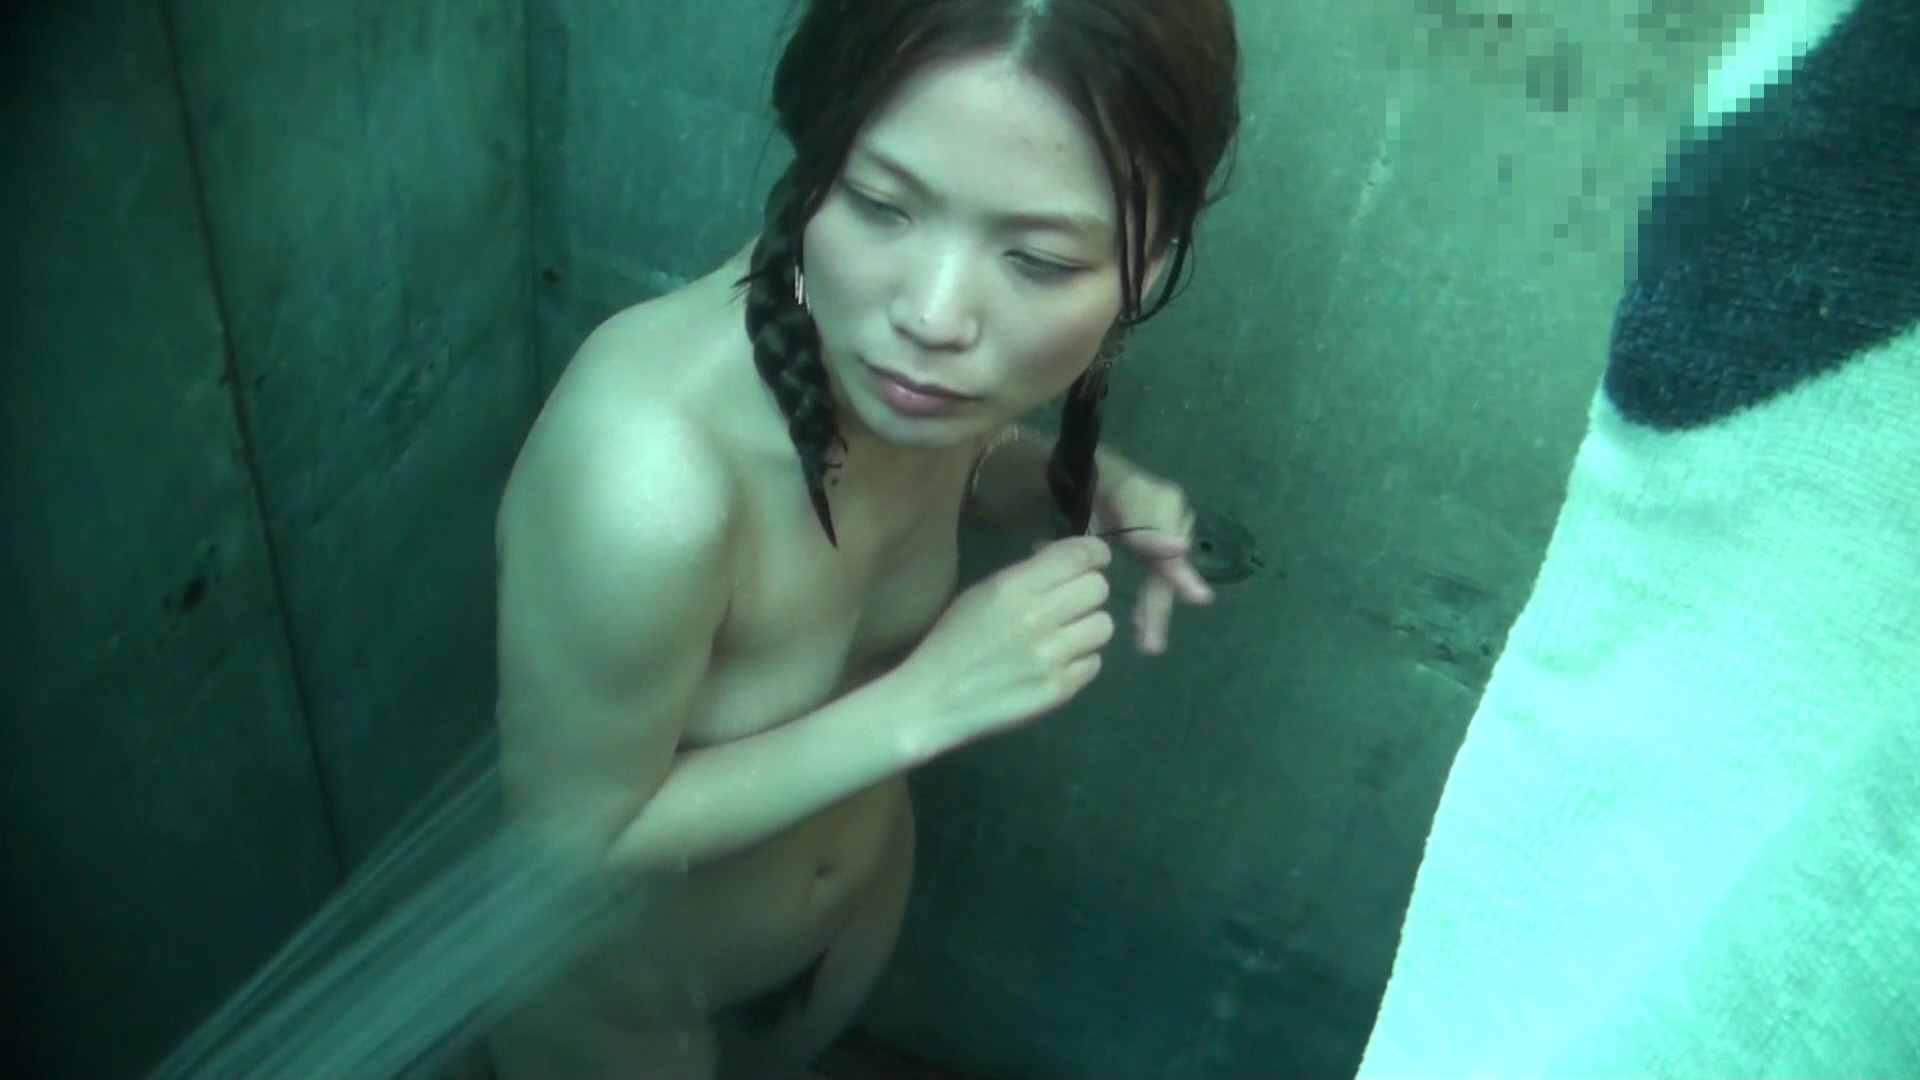 Vol.12 女性の性器には予想外の砂が混入しているようです。 シャワー中 | 高画質  96連発 54